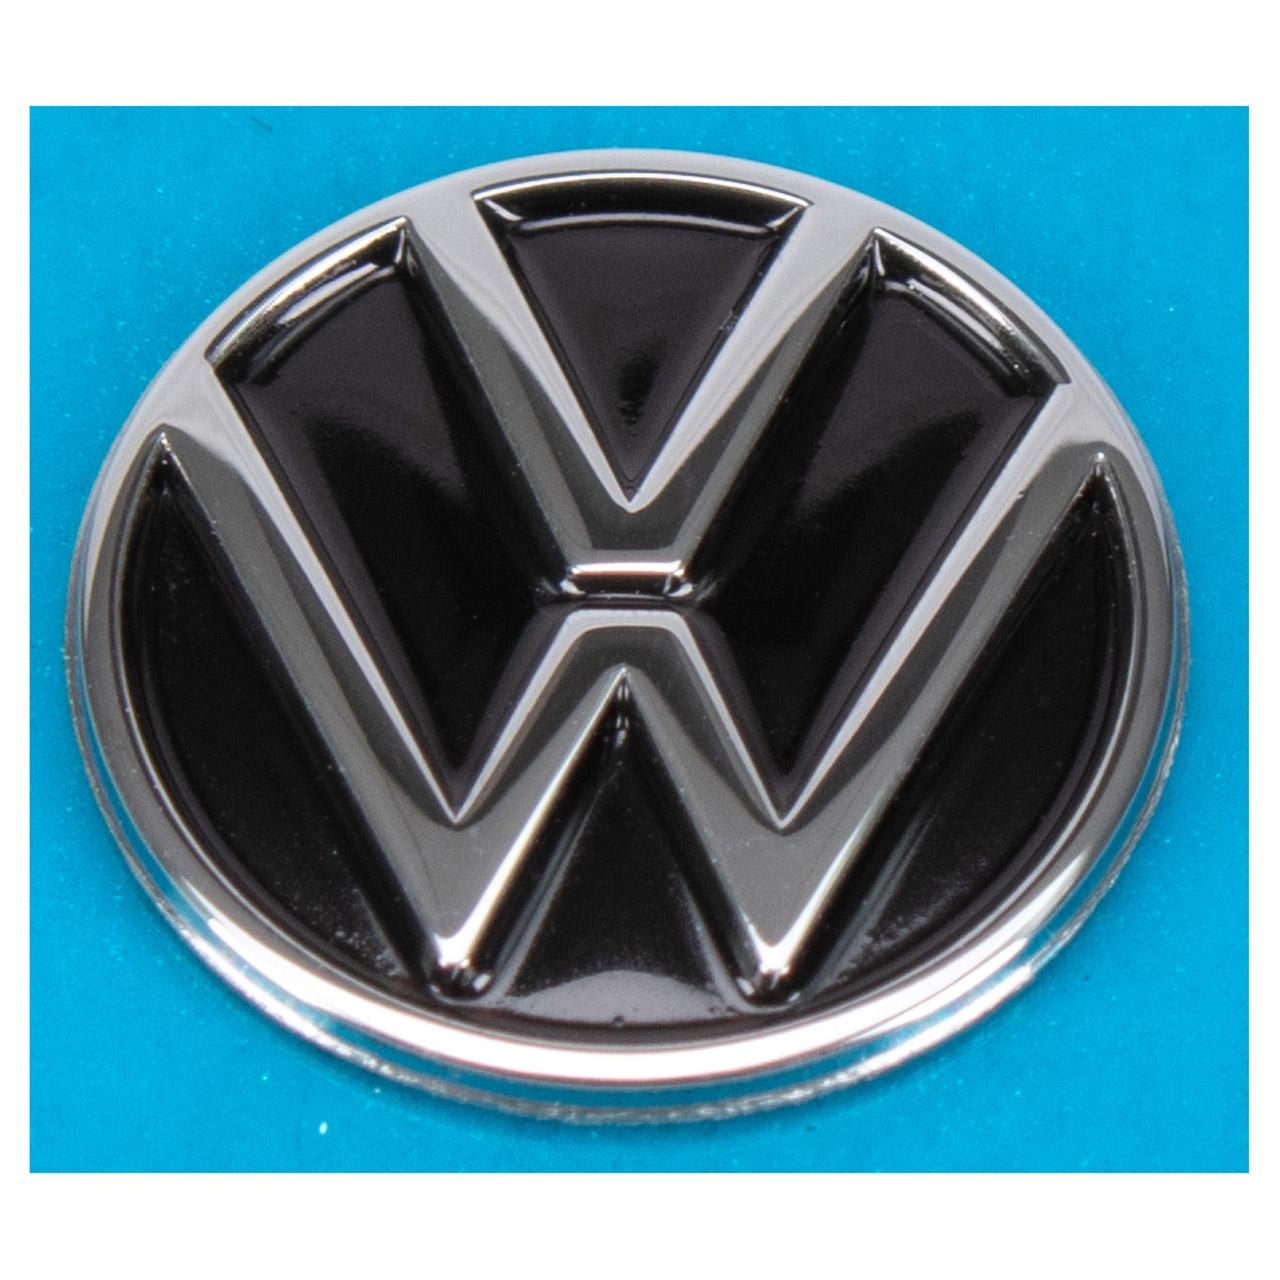 ORIGINAL VW Emblem Logo Symbol Schlüsselgehäuse Touran Polo T-Roc T6 Tiguan 3G0837891 2ZZ